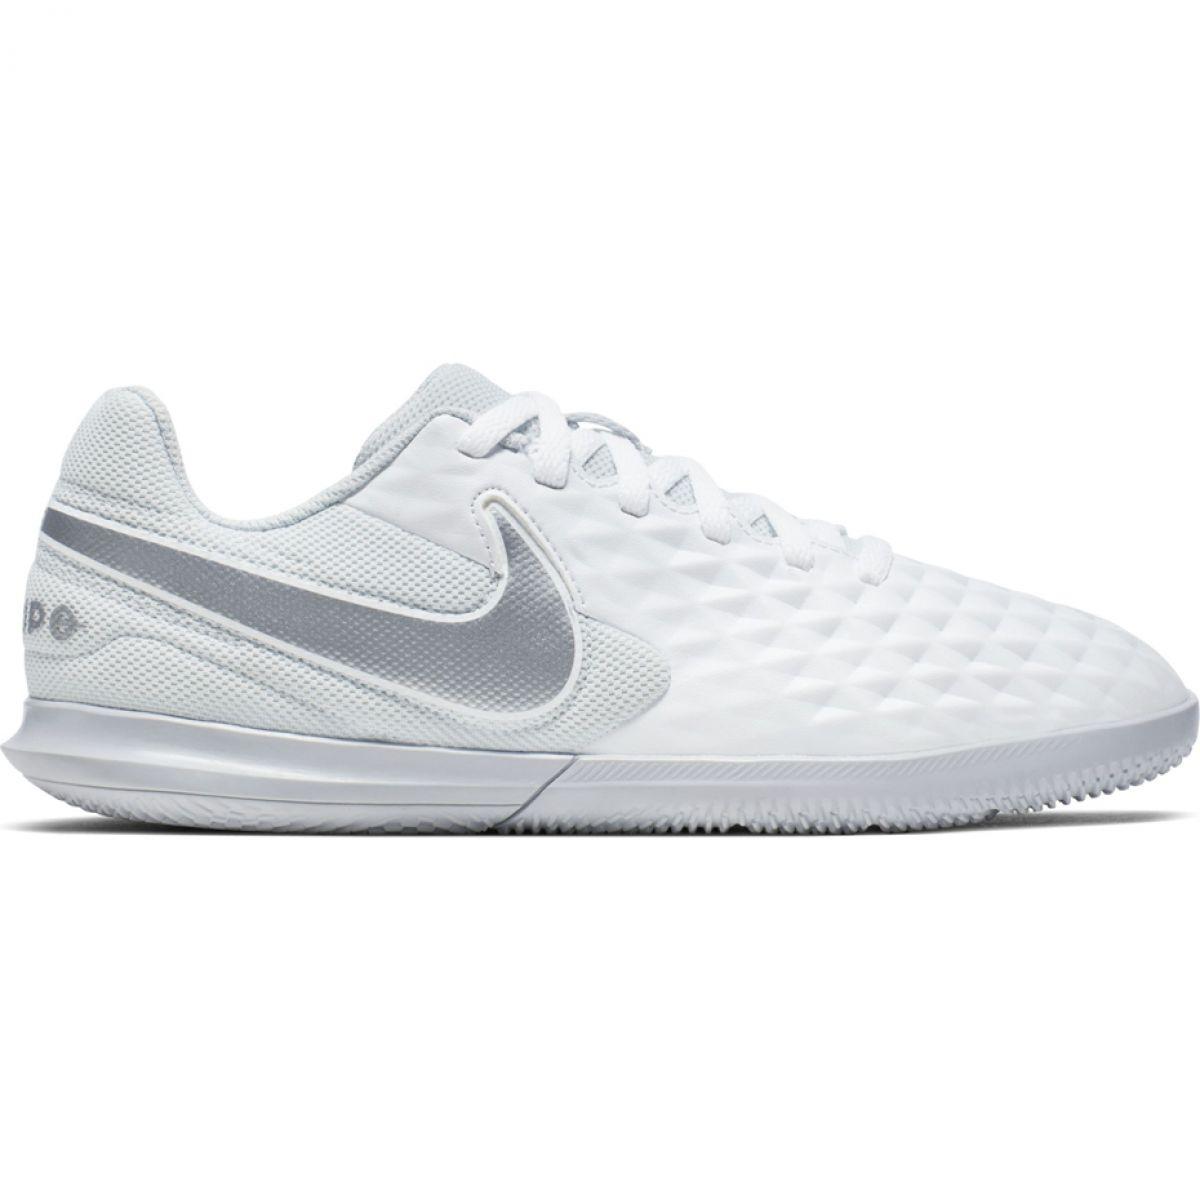 Terminal Para editar hostilidad  Indoor shoes Nike Tiempo Legend 8 Club Ic Jr AT5882-100 white white -  ButyModne.pl